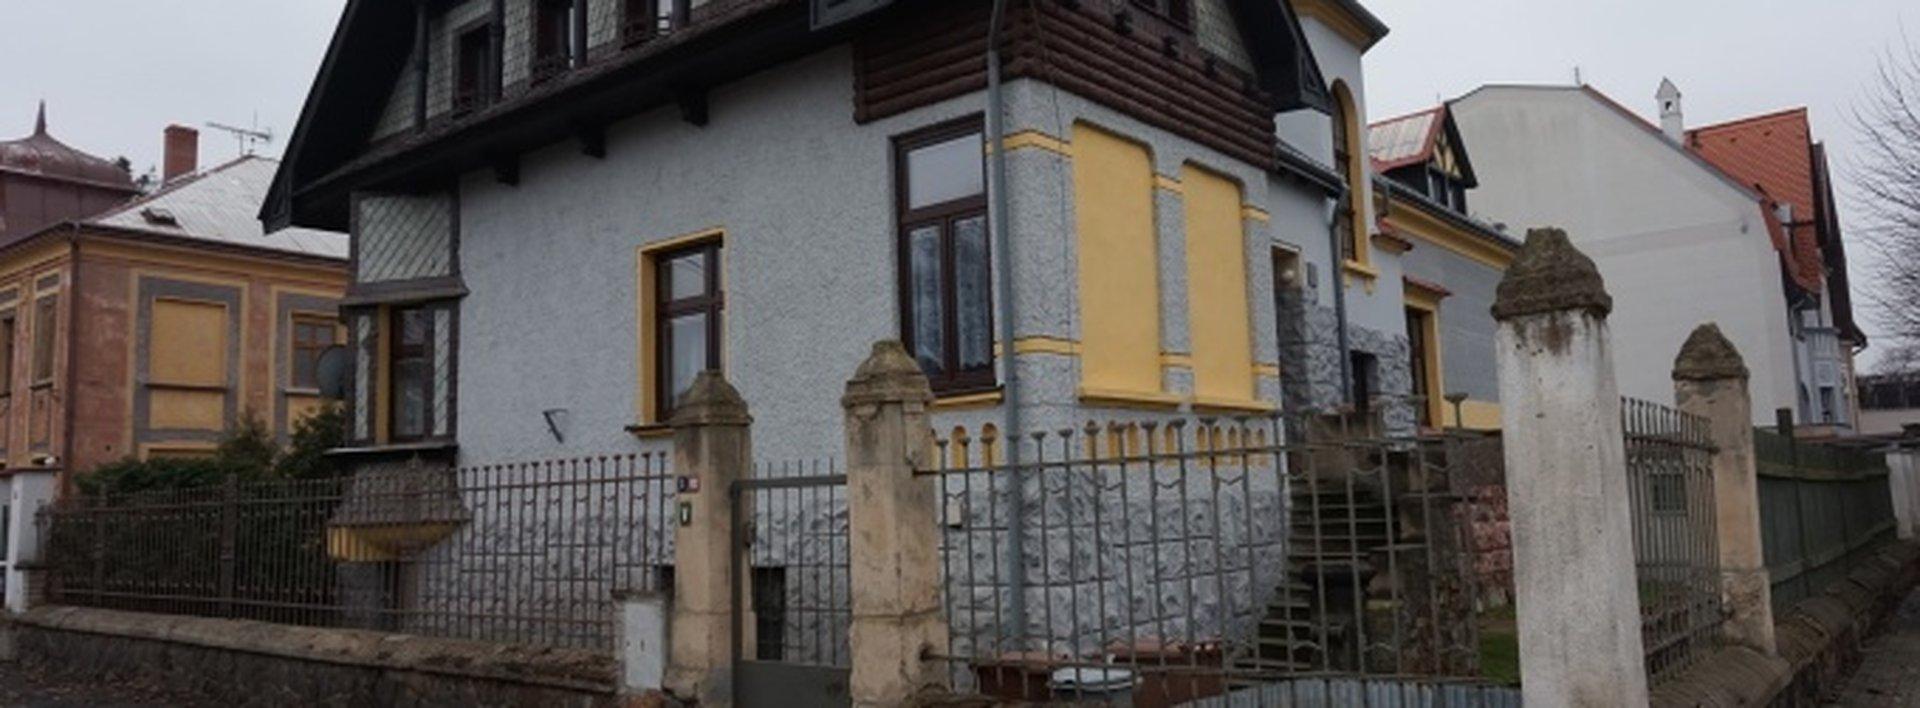 Prodej, Byty 2+1, 124 m², ul. Tyršova, Duchcov., Ev.č.: N47921